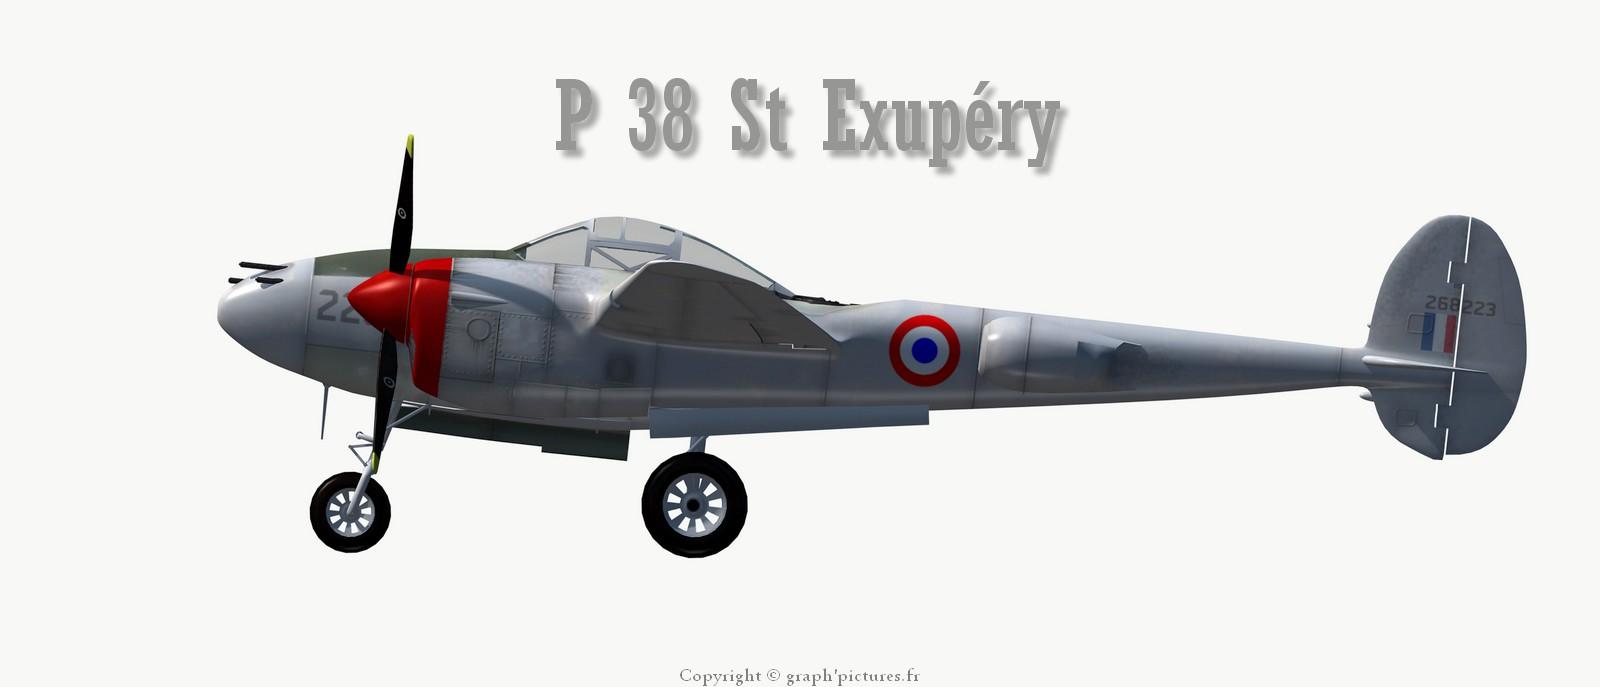 P38 lightning 547807profilstexupryp38